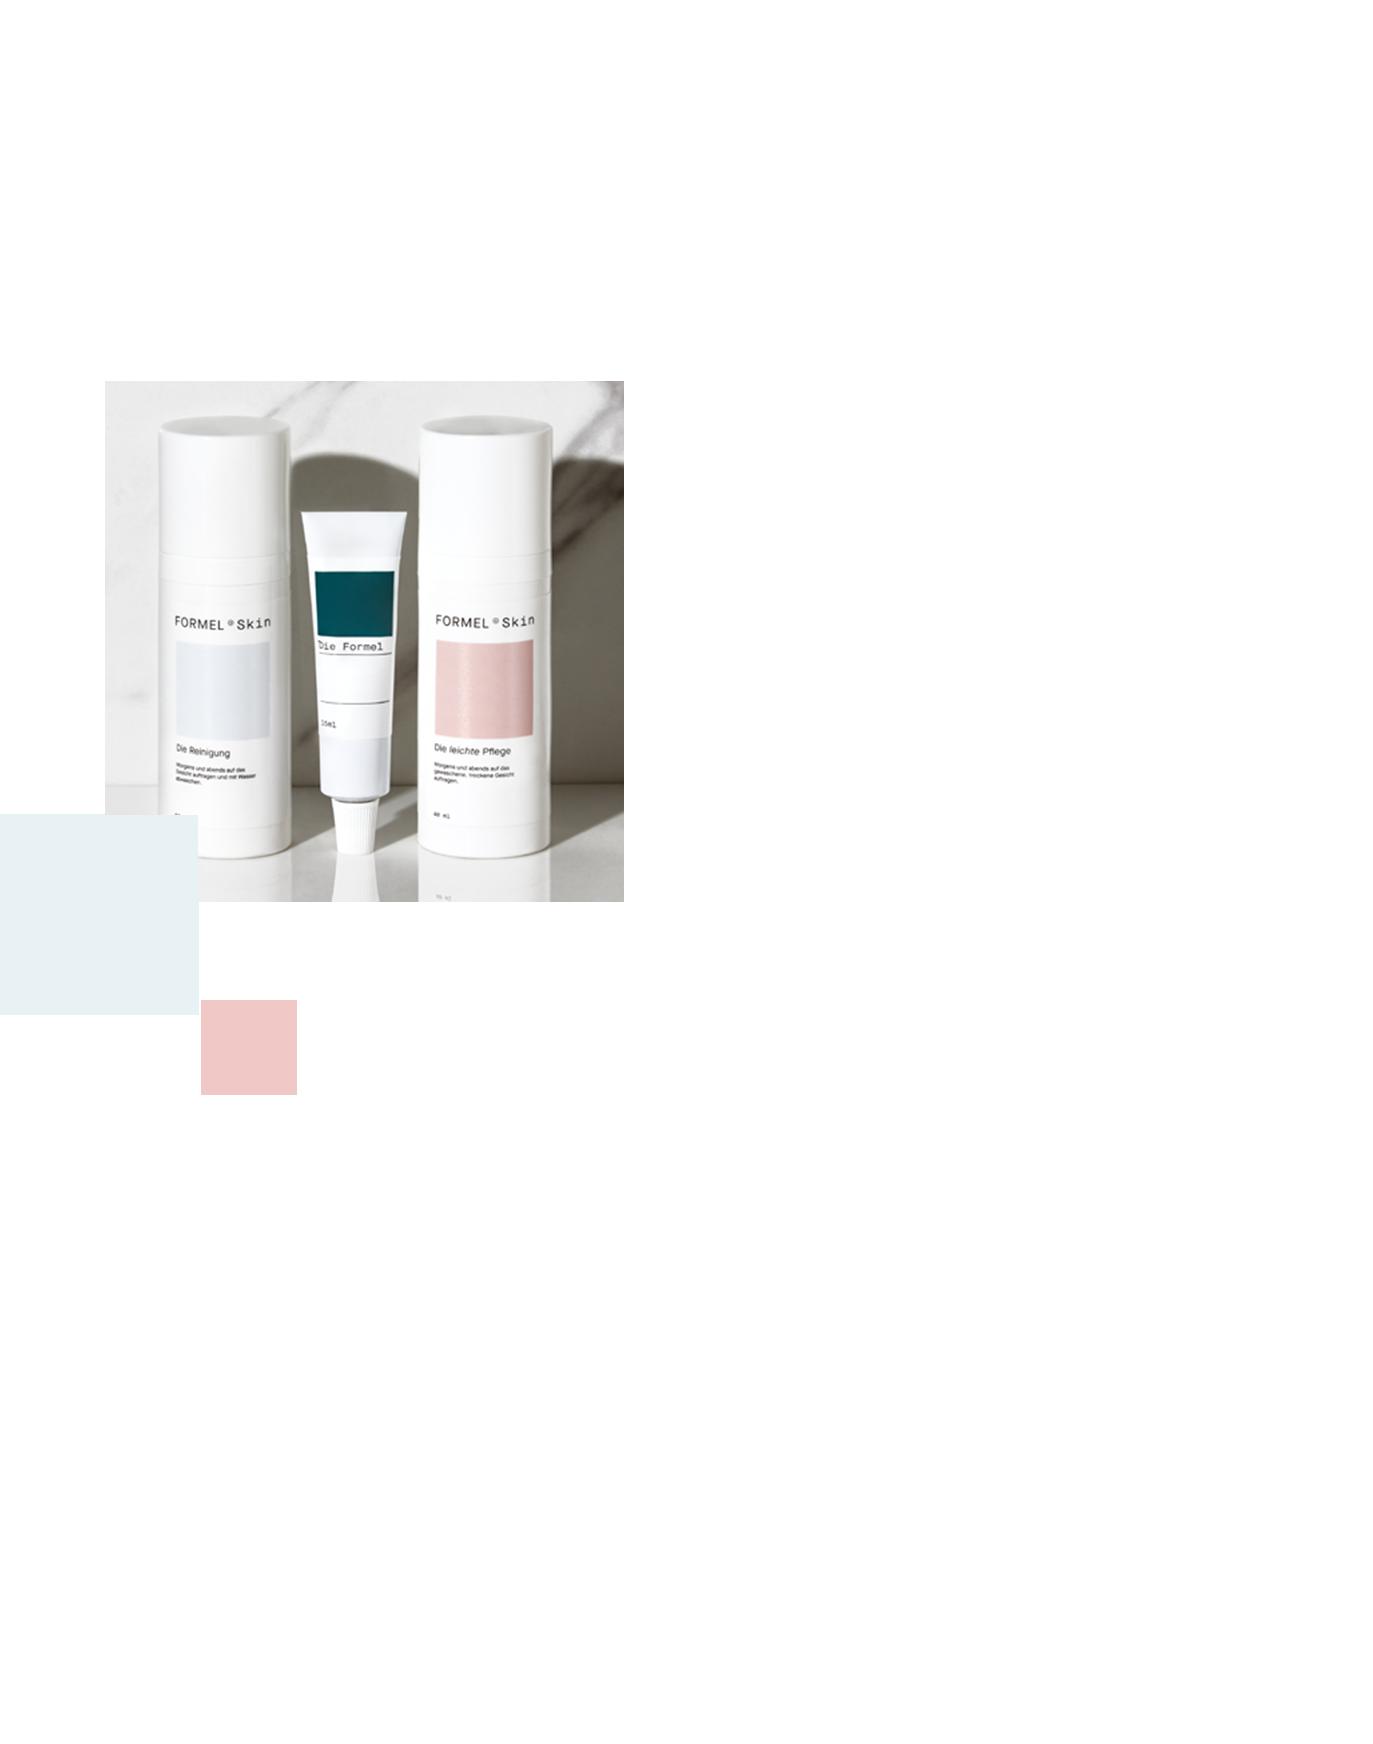 Medizinische Hautpflege bei [Mitesser] [Akne] [Pigmentflecken] [Rosazea] [reifer Haut]